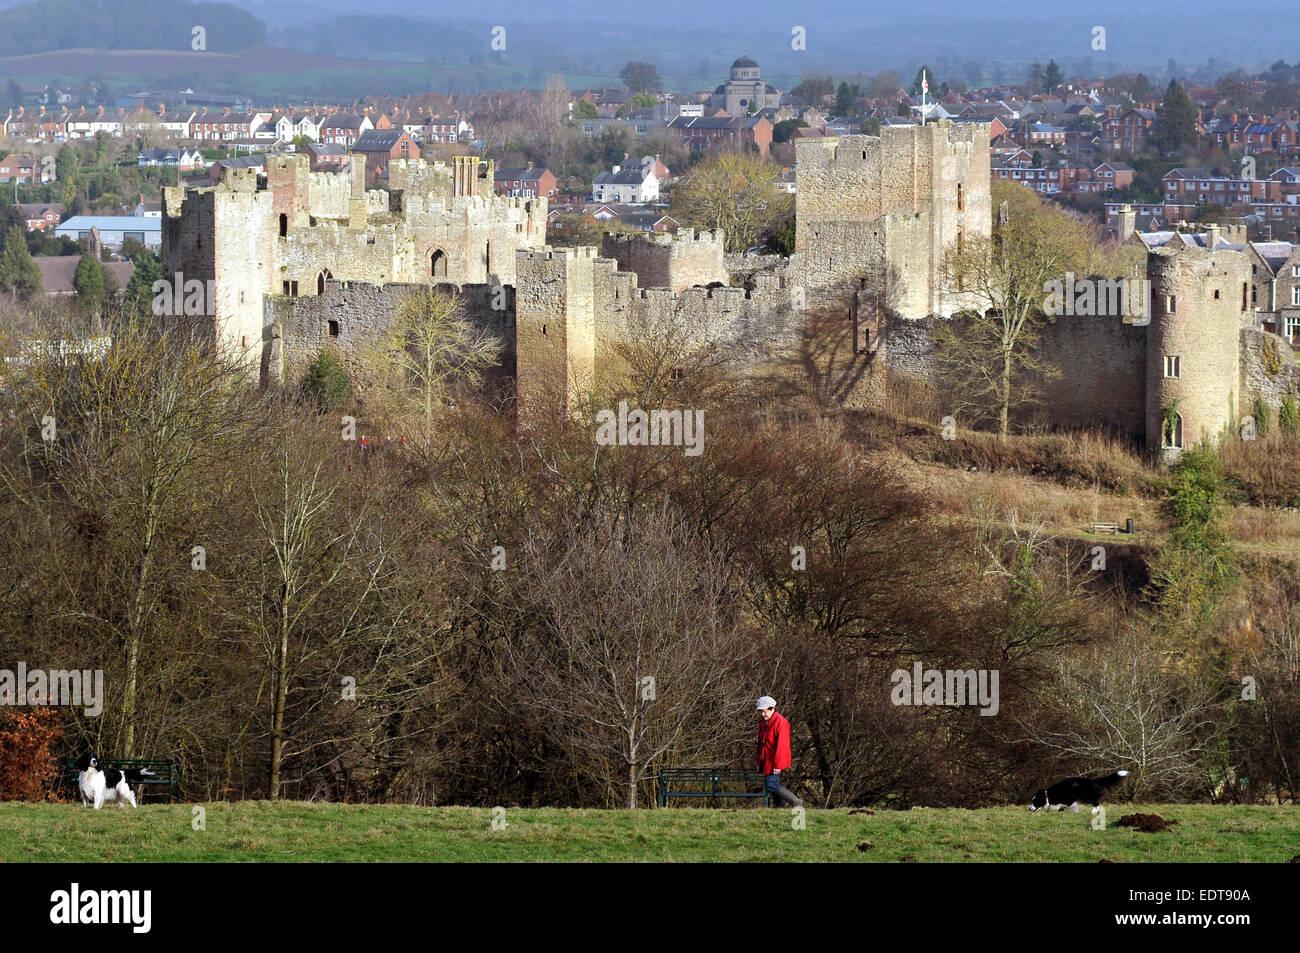 Ludlow, Shropshire, UK. 9th January, 2015. Unusually warm seasonal weather in Ludlow, Shropshire UK. A woman walks - Stock Image